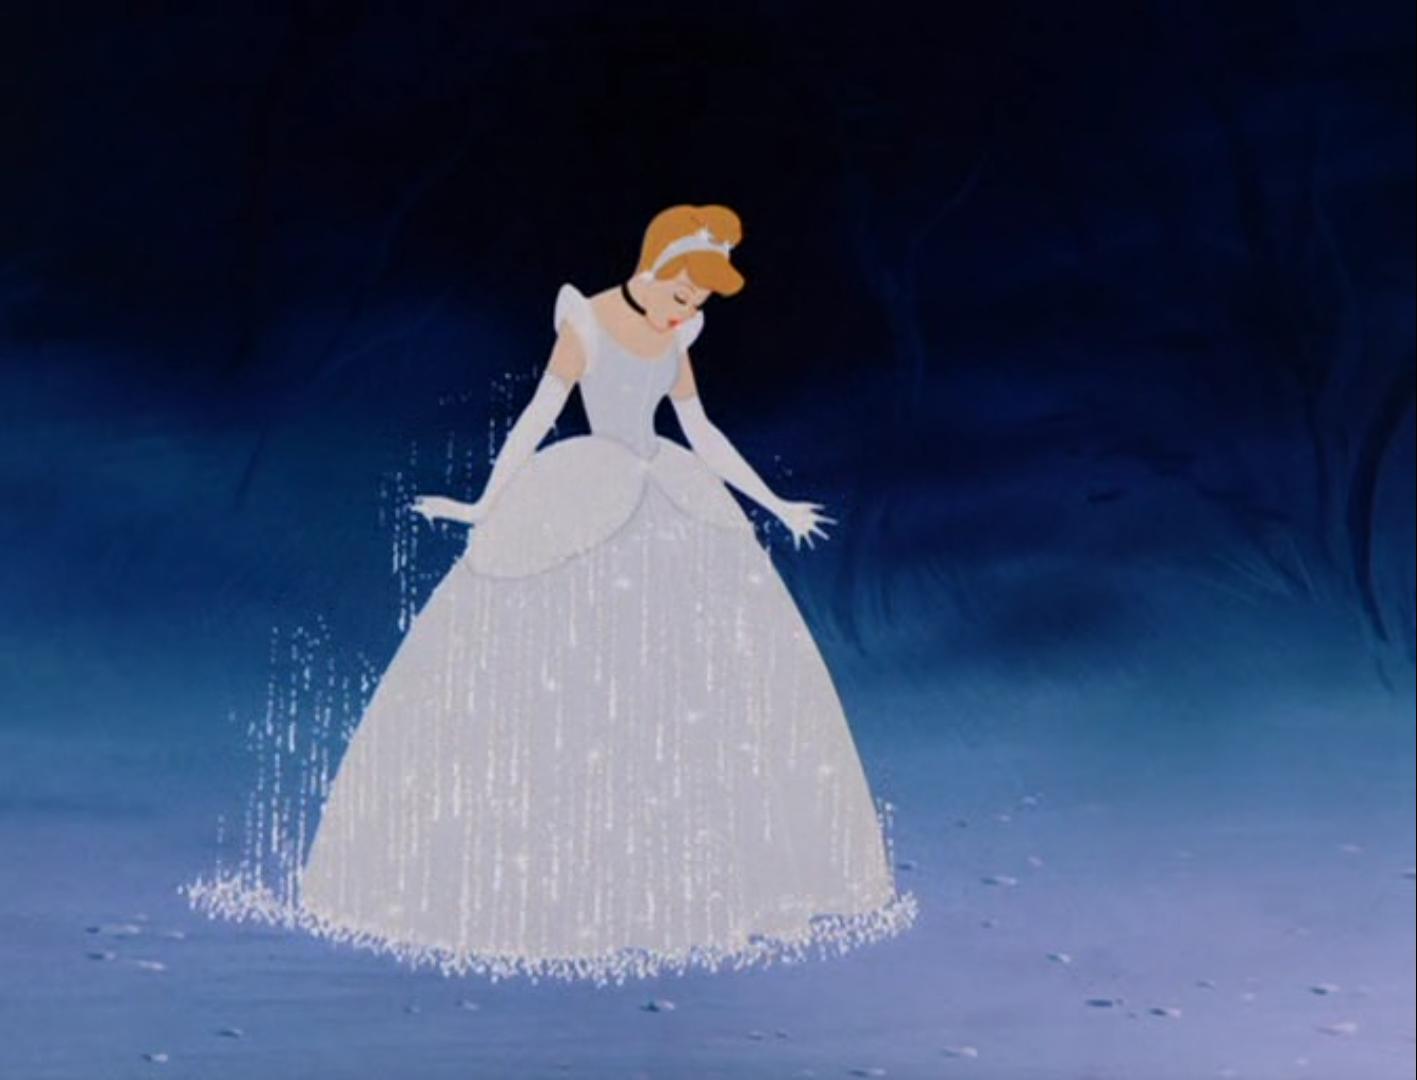 Disney S Cinderella S And The Evolution Of The Princess Aesthetics